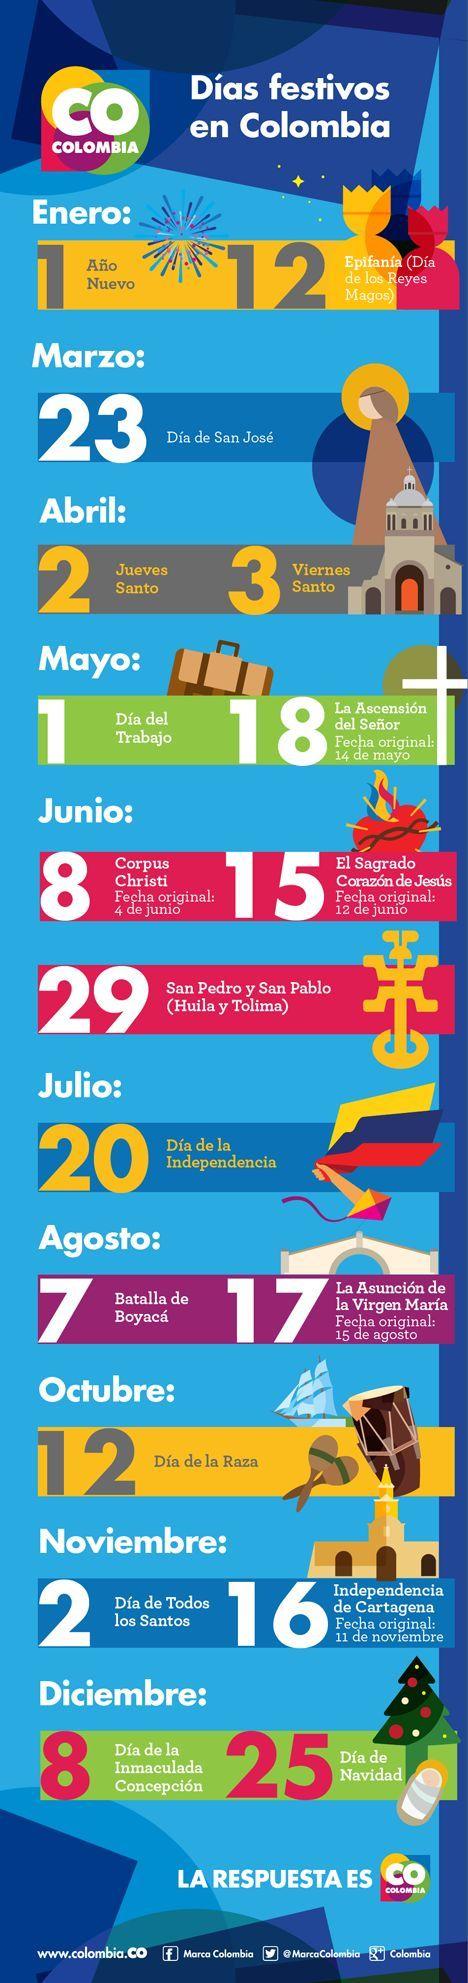 Holiday calendar Colombia Calendario de dias festivos